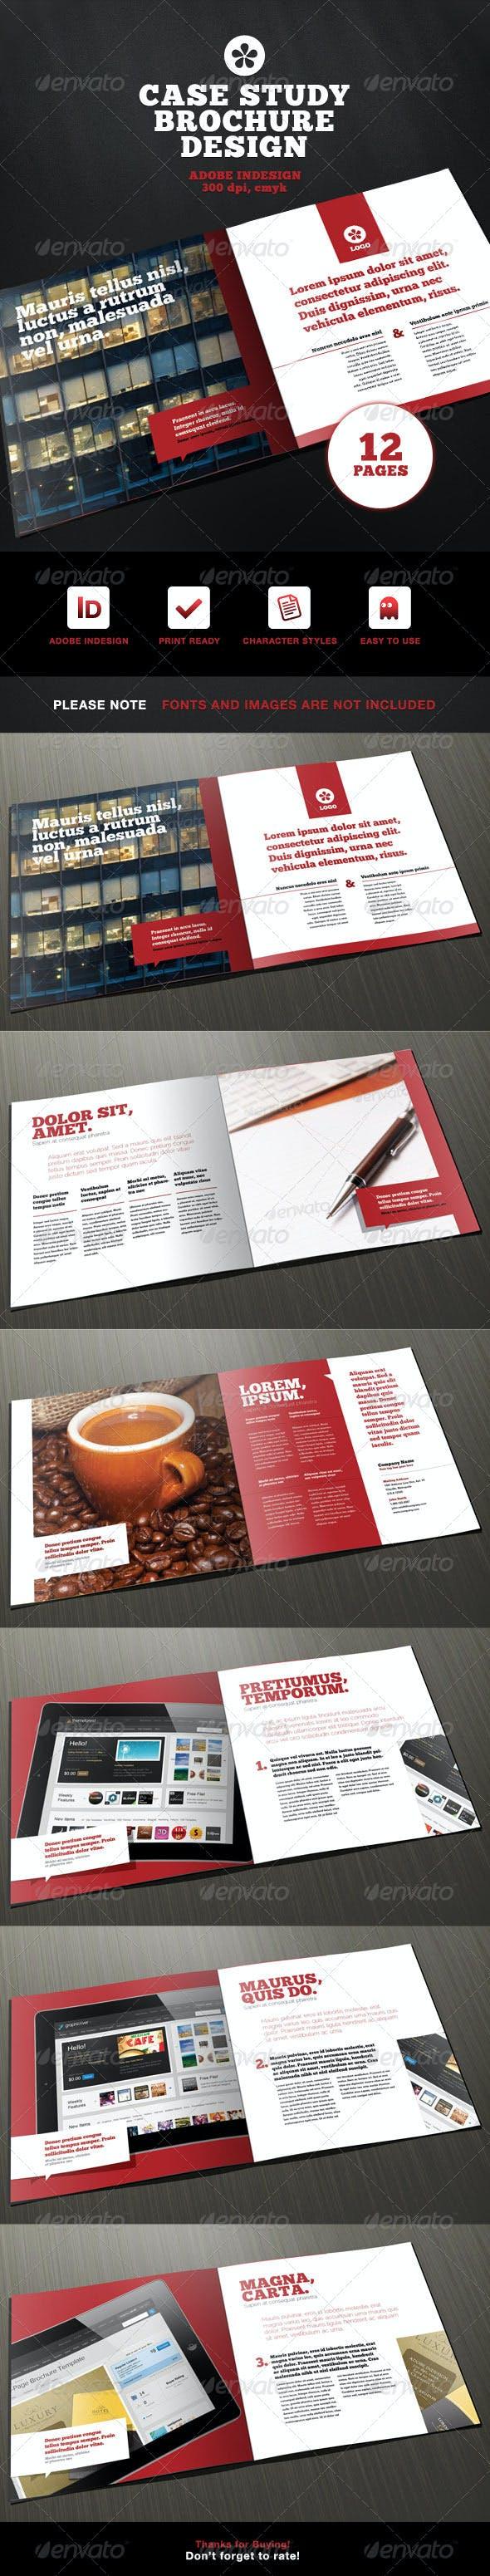 Menu For Olive Garden: Professional Case Study Brochure Design By Ramijames